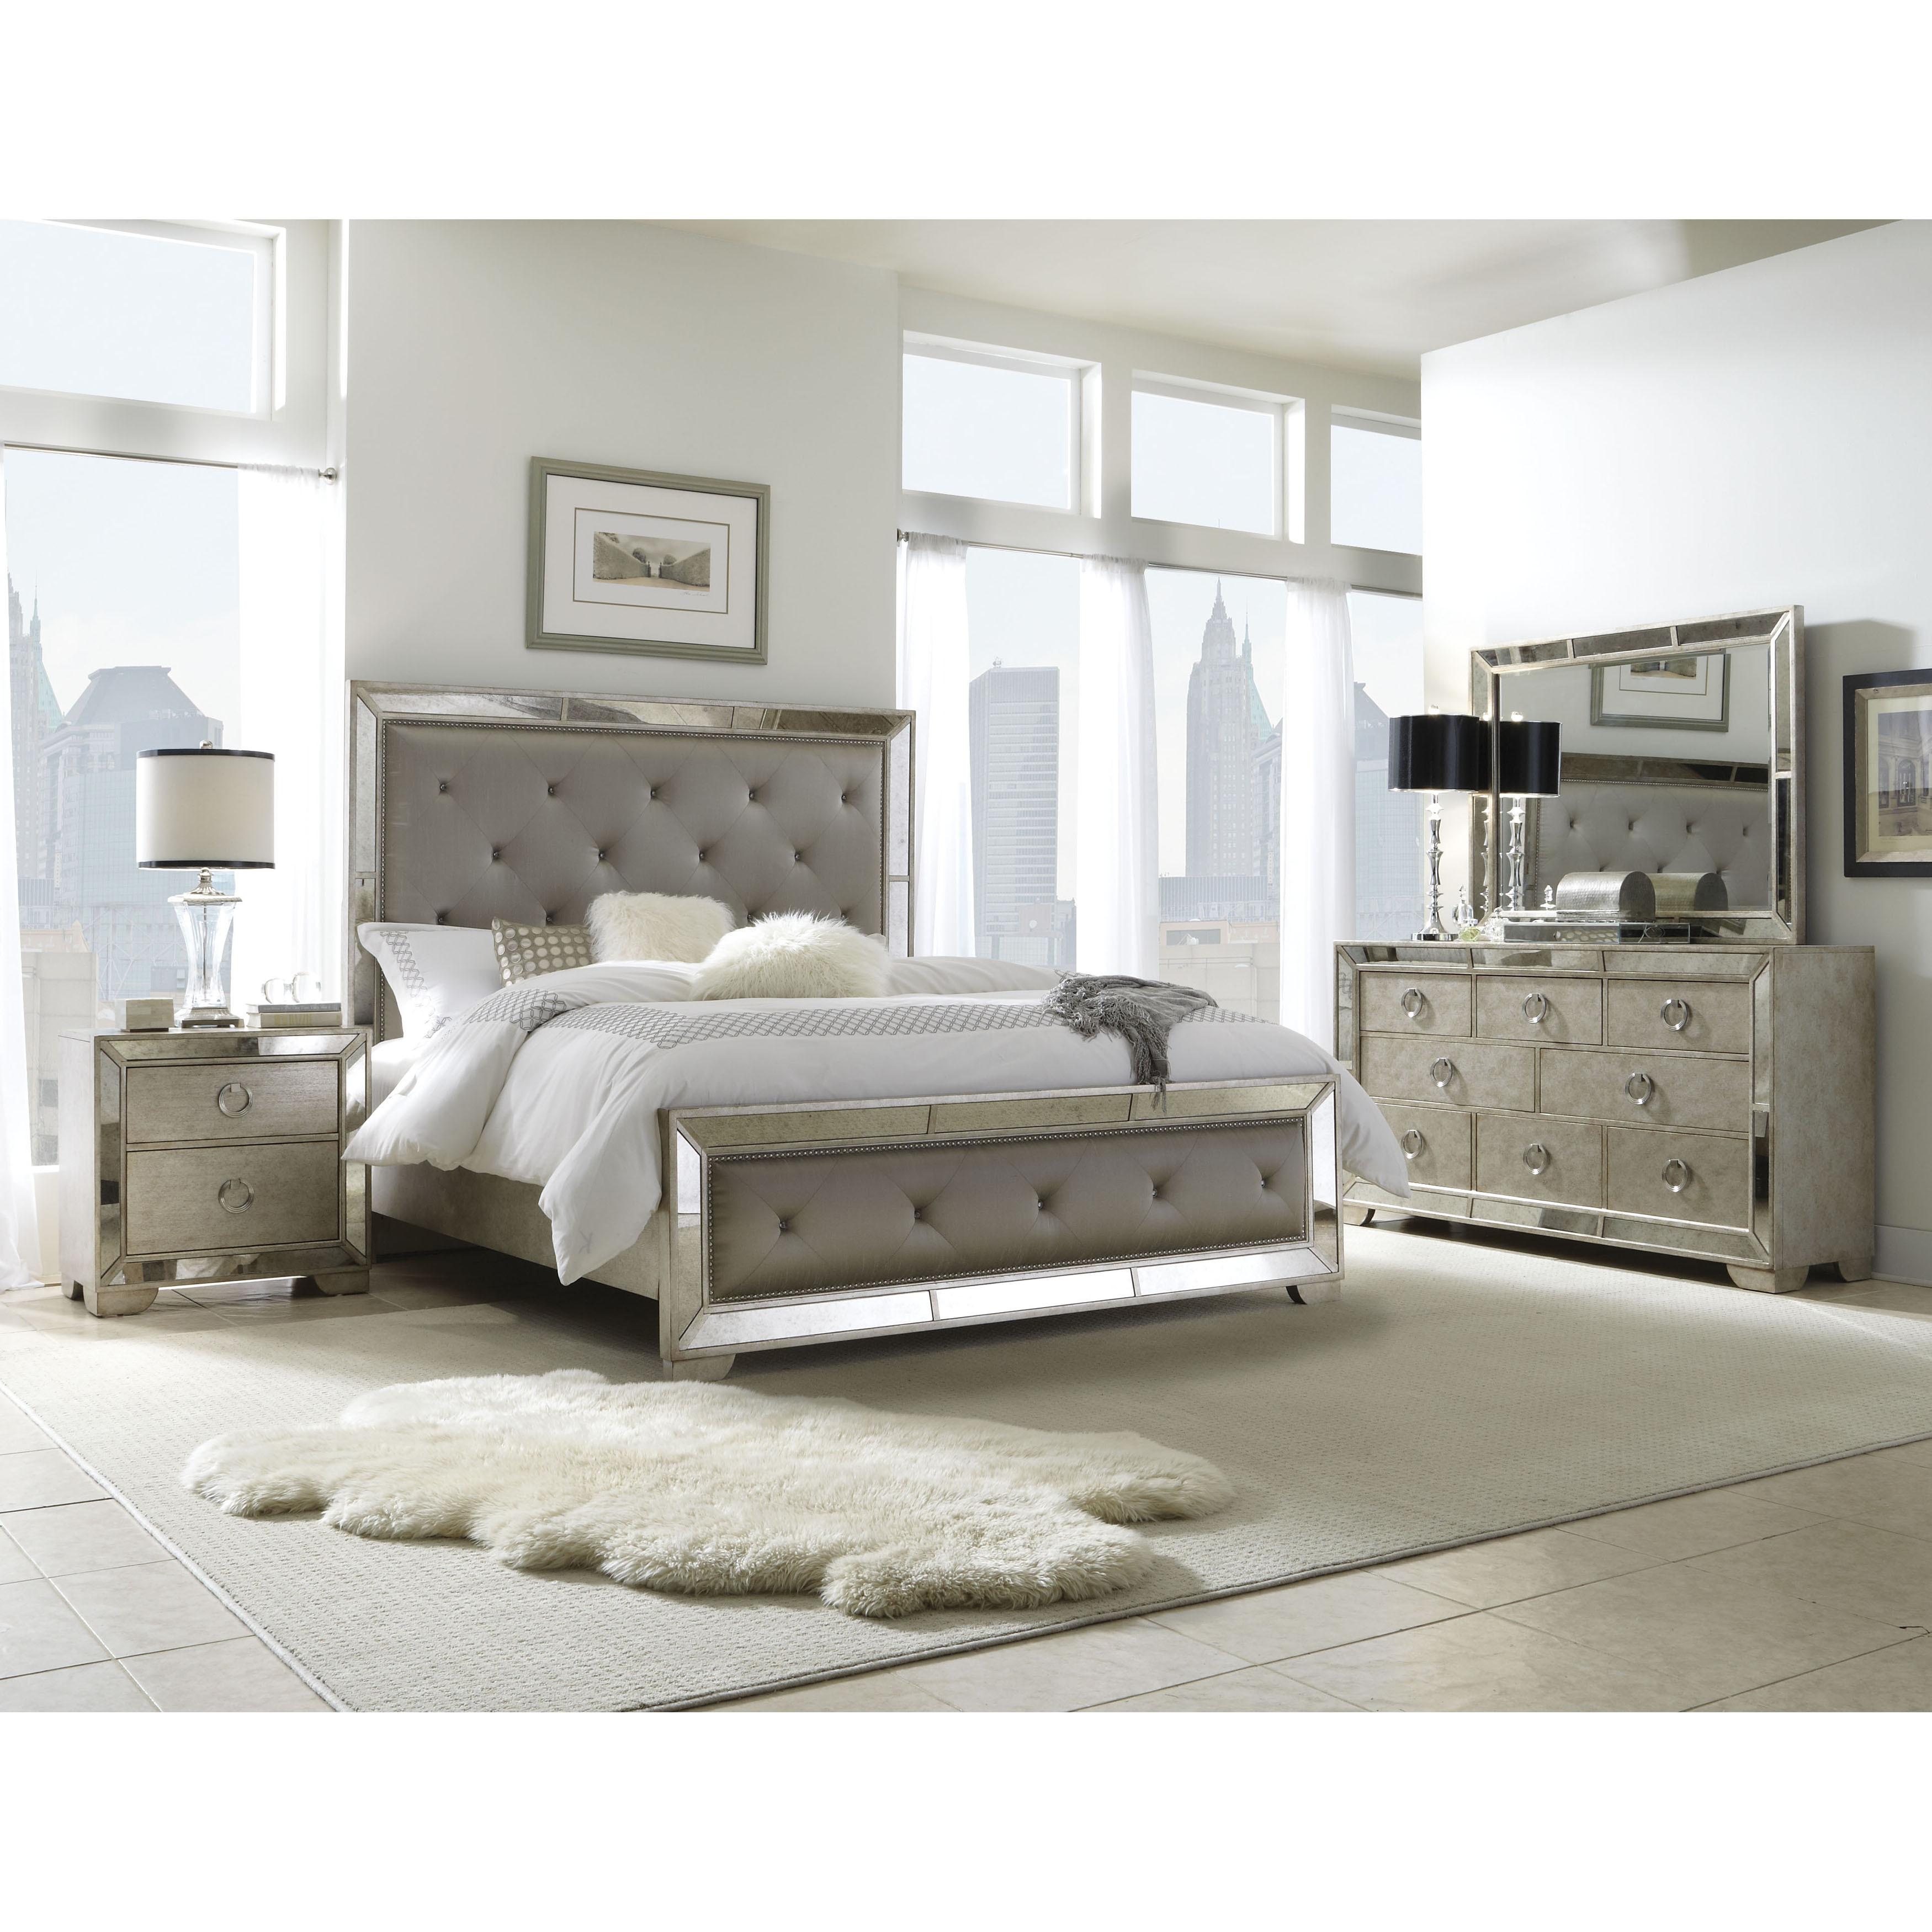 mirrored furniture bedroom set photo - 2